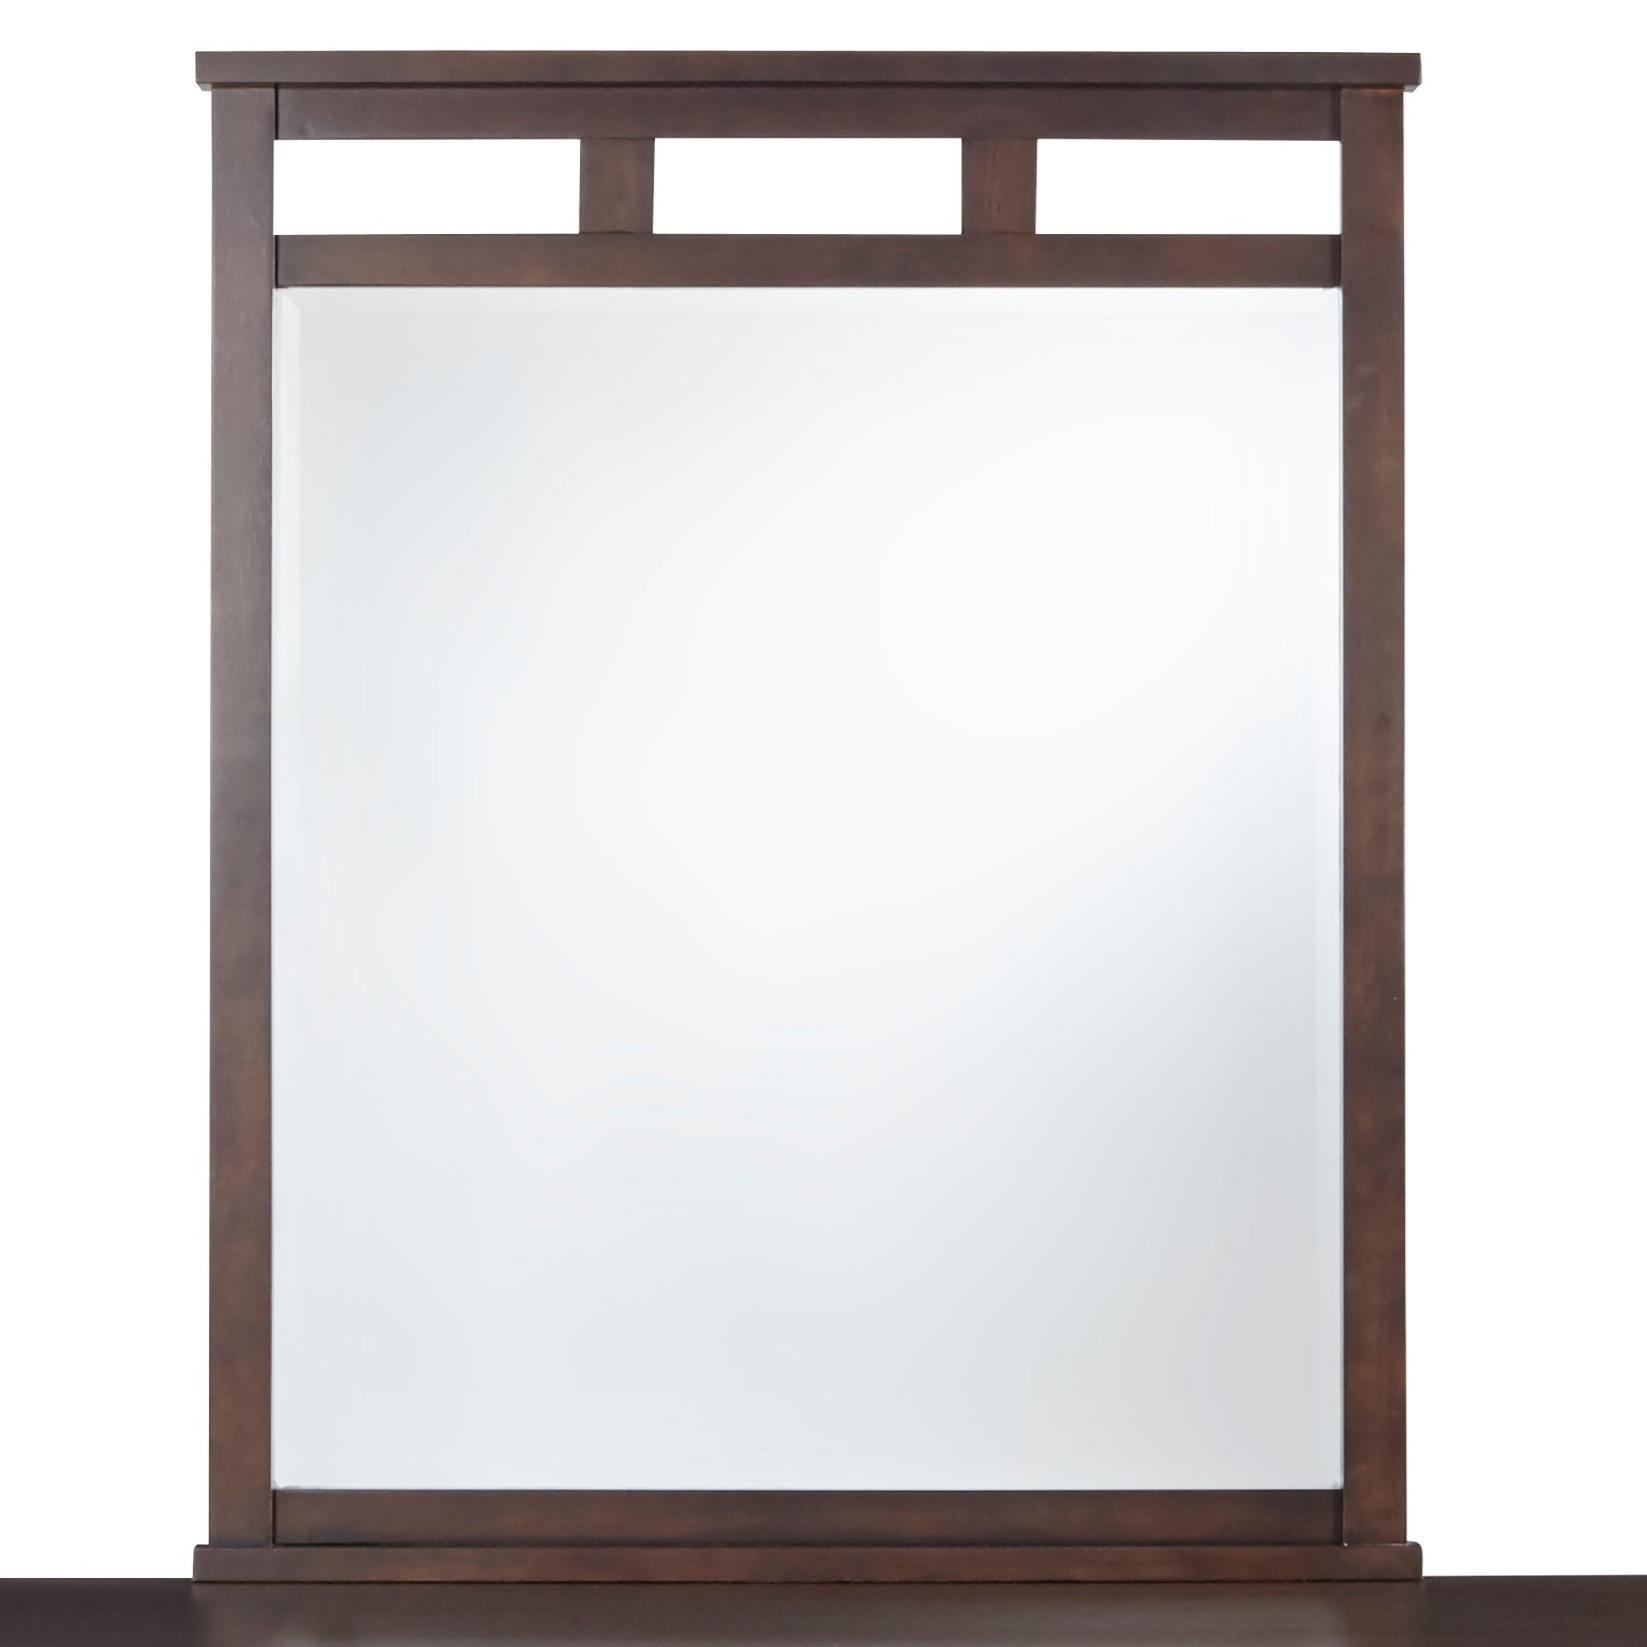 Athena Mirror by Progressive Furniture at Value City Furniture